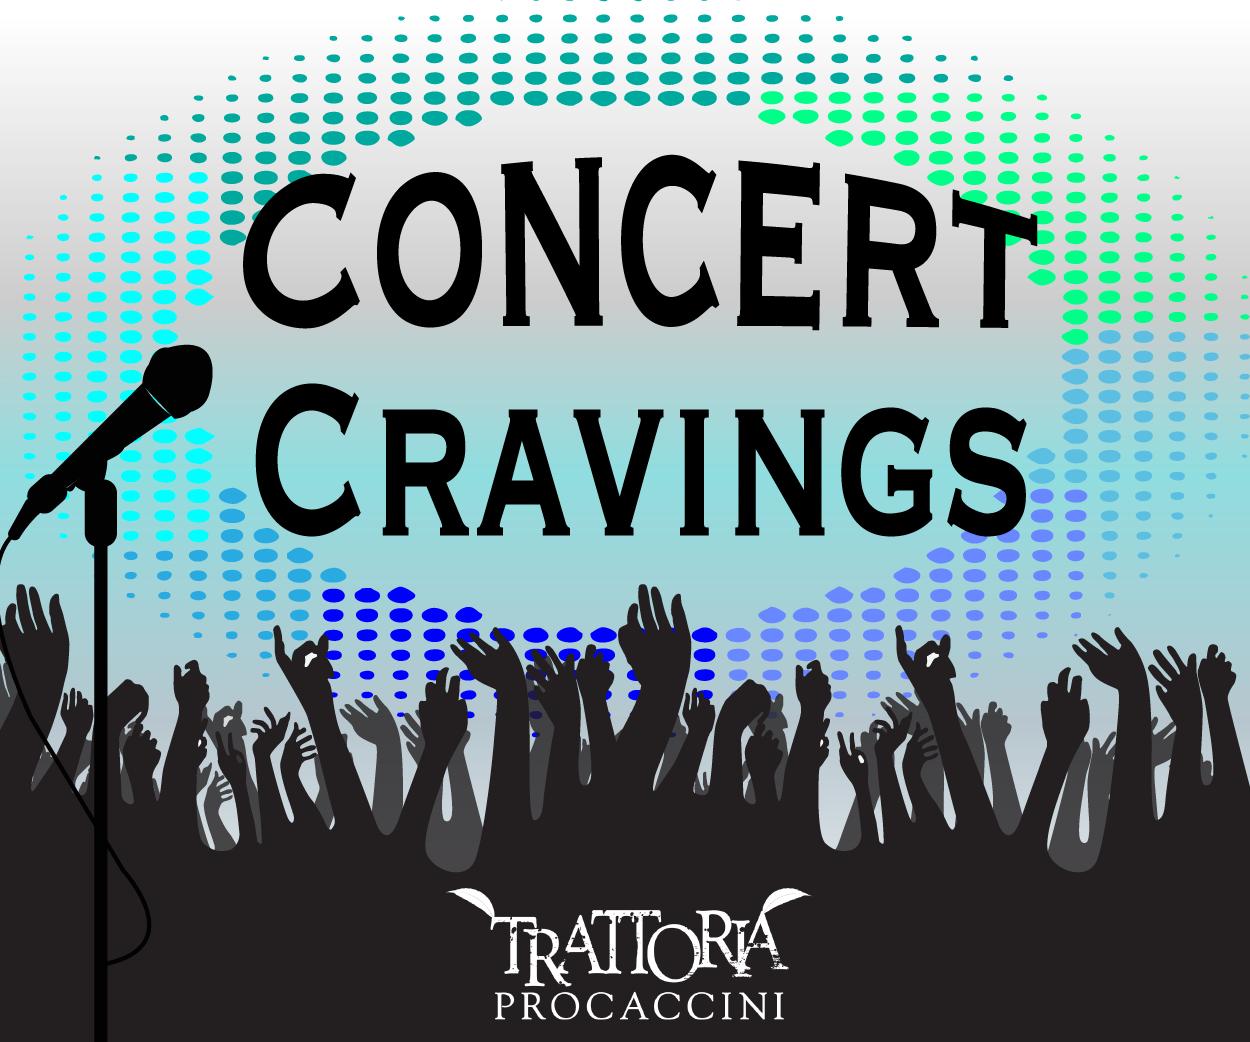 Trattoria Procaccini's Concert Cravings – 107 7 The Bronc WRRC-FM